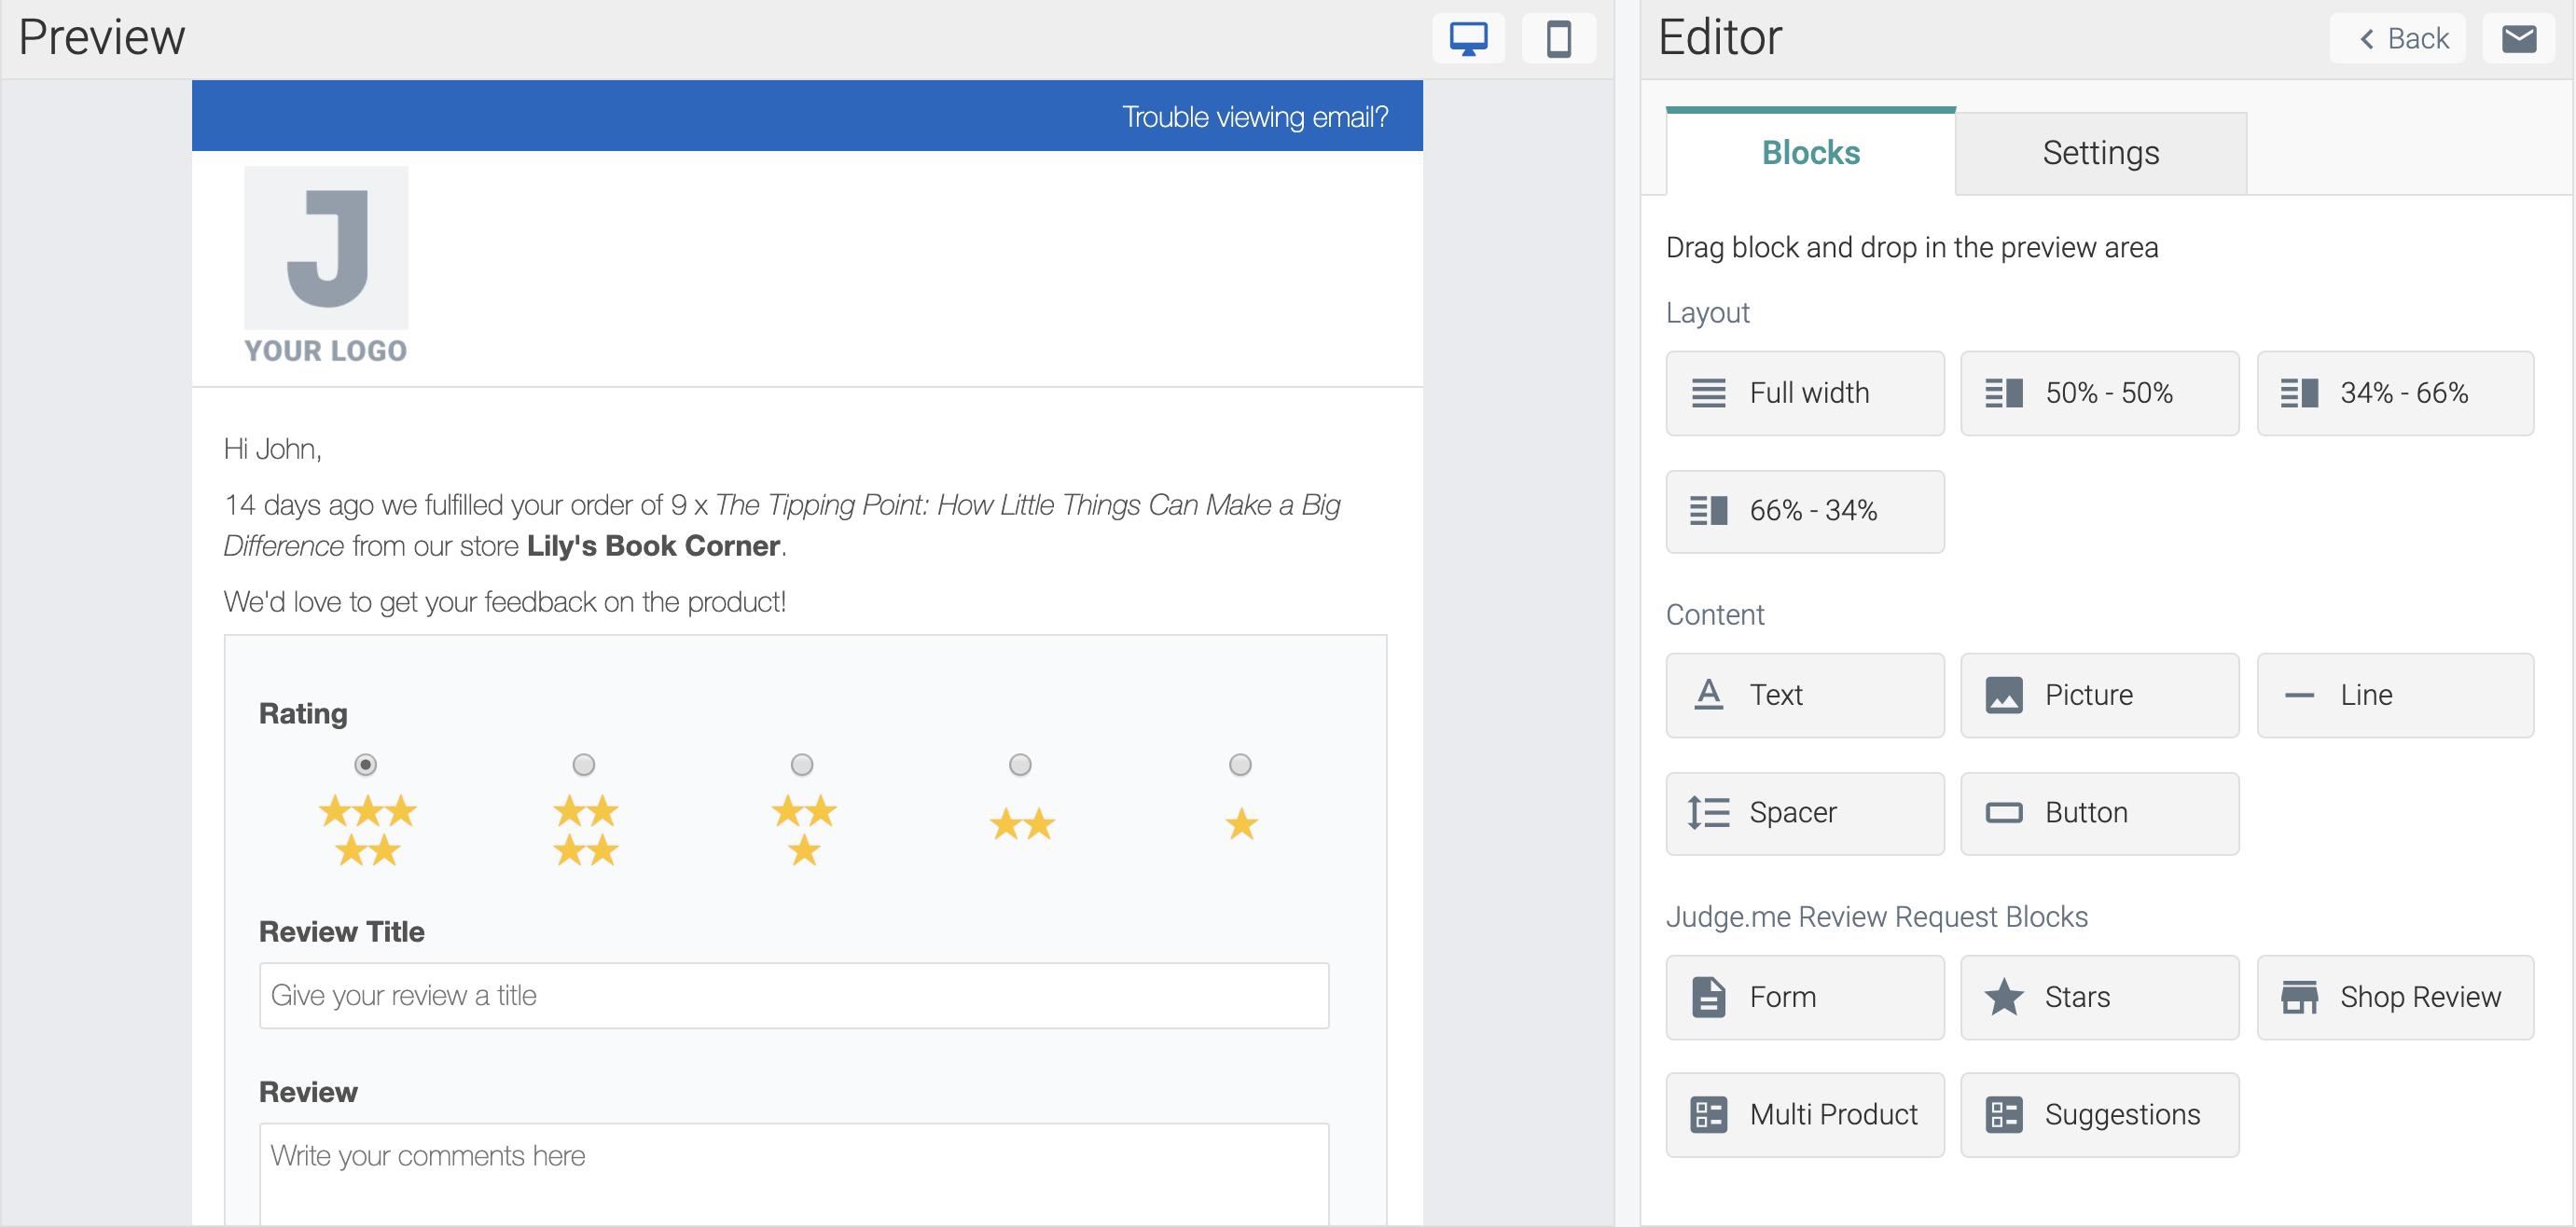 judgeme email templates blocks